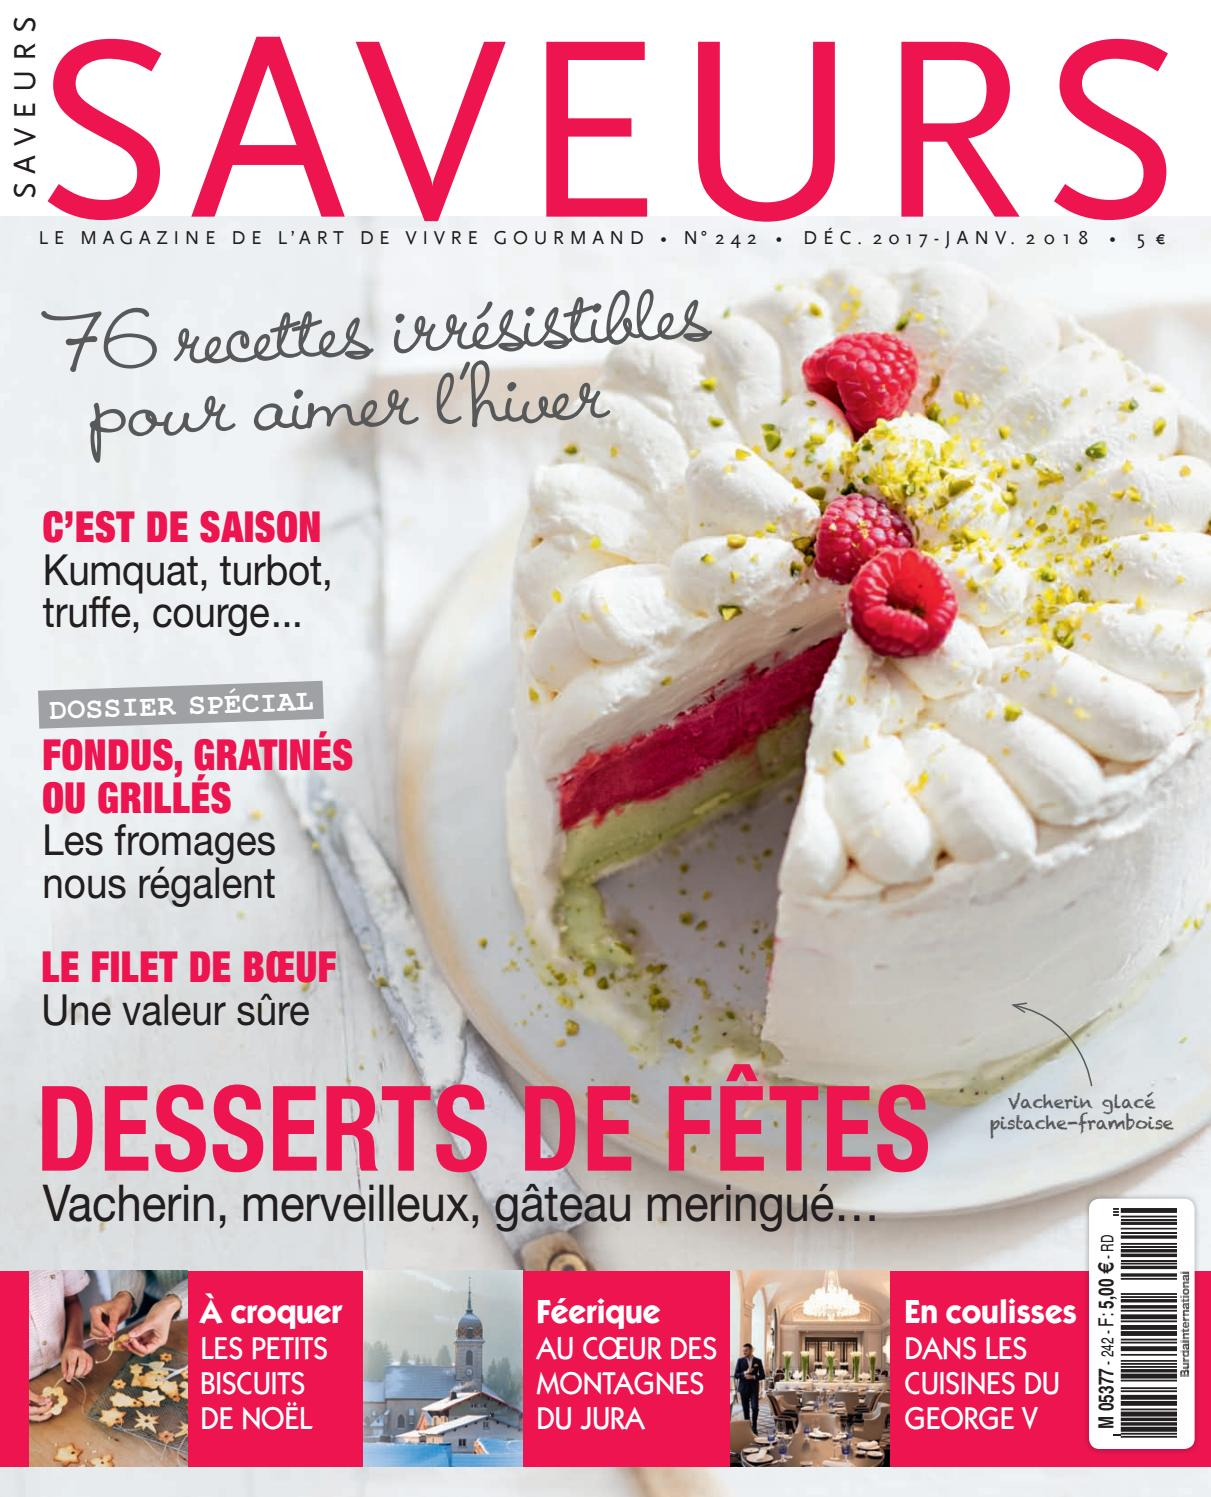 Extrait Pdf Saveurs 242 By Saveurs Magazine Issuu